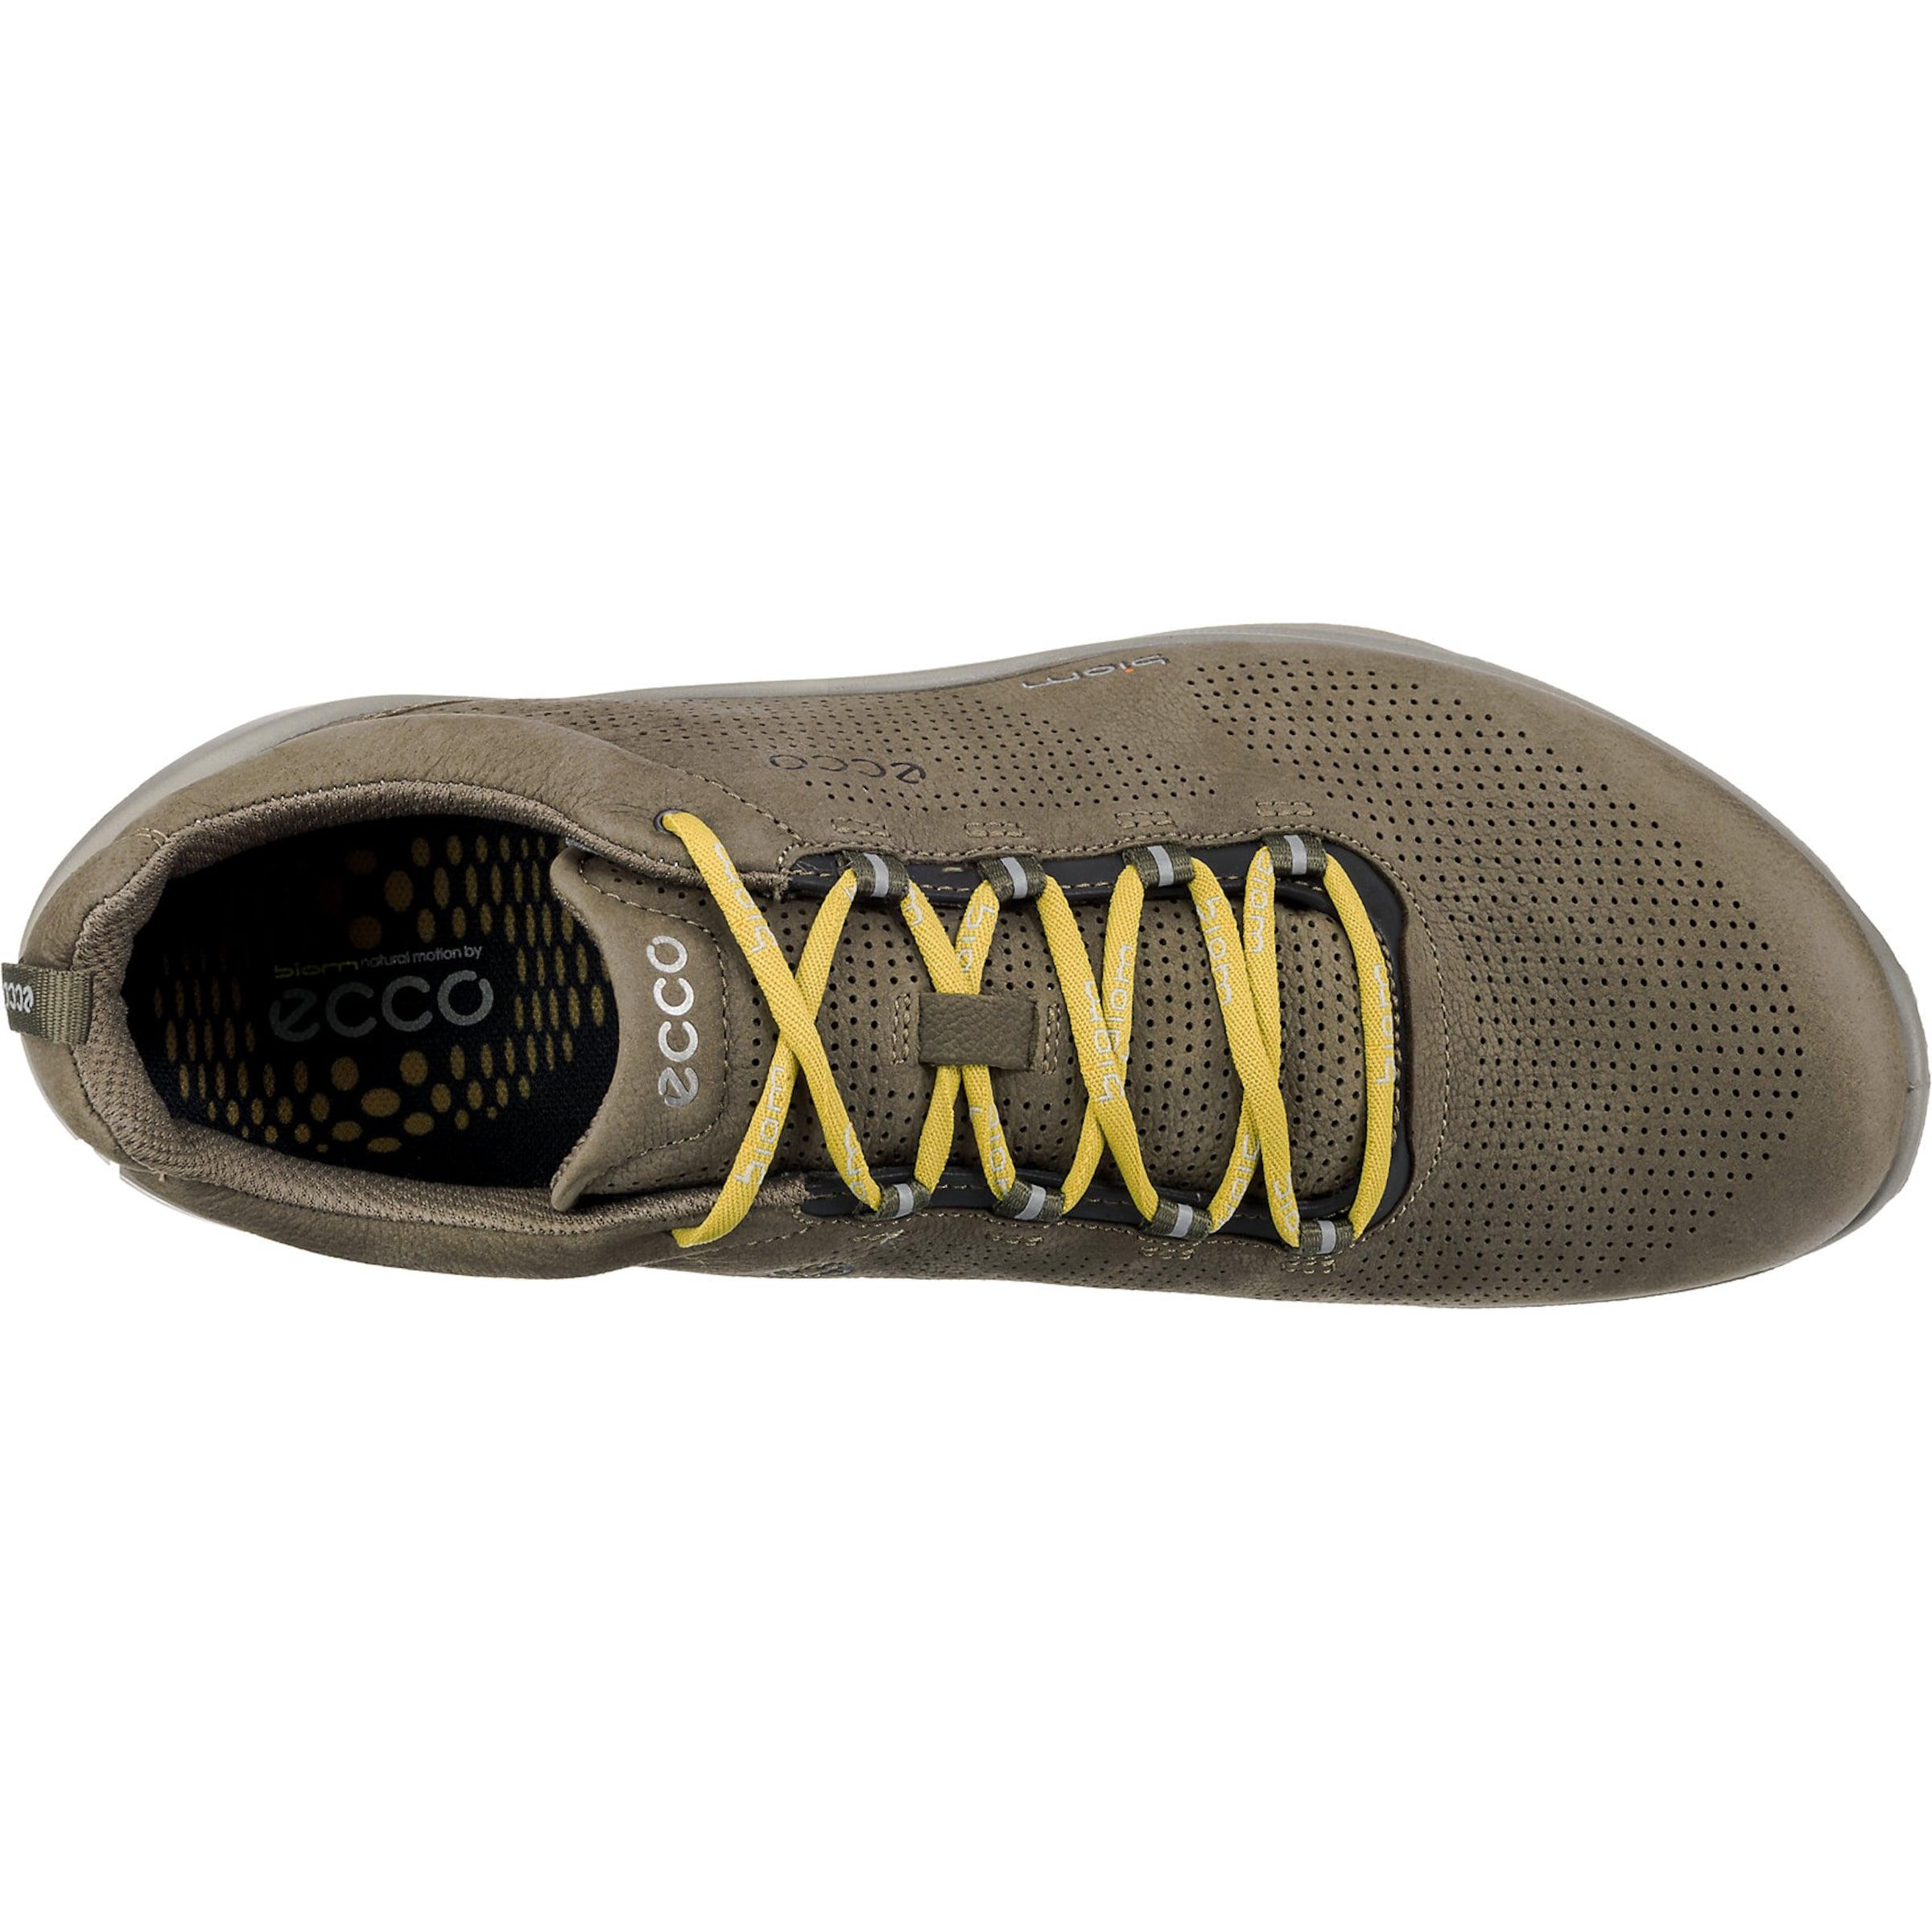 BrokatGrau Fjuel' Ecco Low Sneakers In 'biom PZiTwkXuO